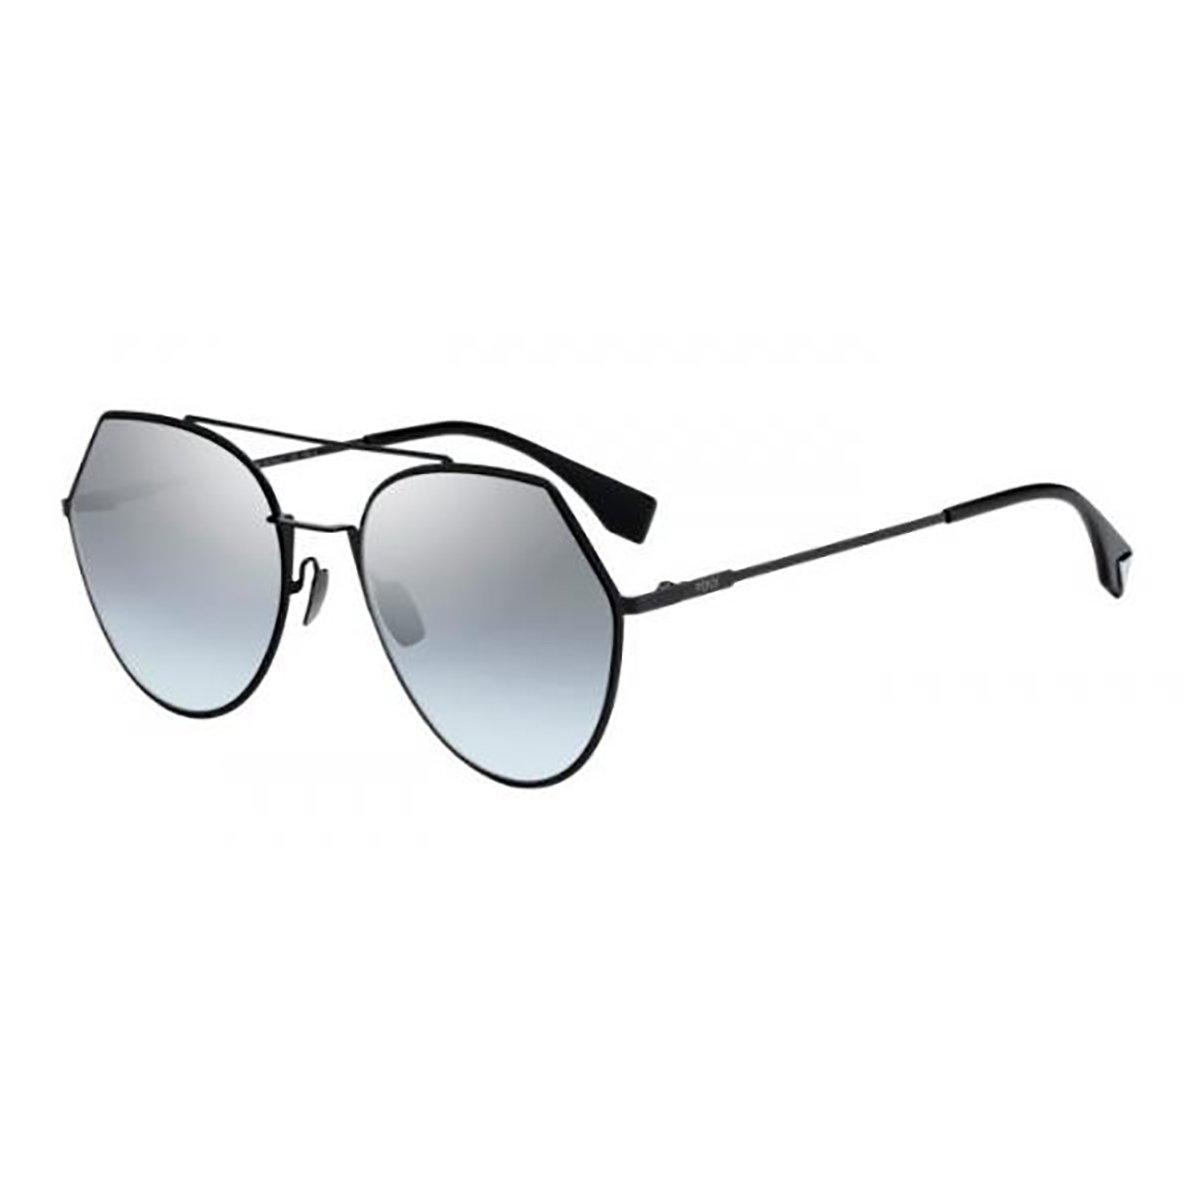 fecd372861274 Compre Óculos de Sol Fendi Eyeline em 10X